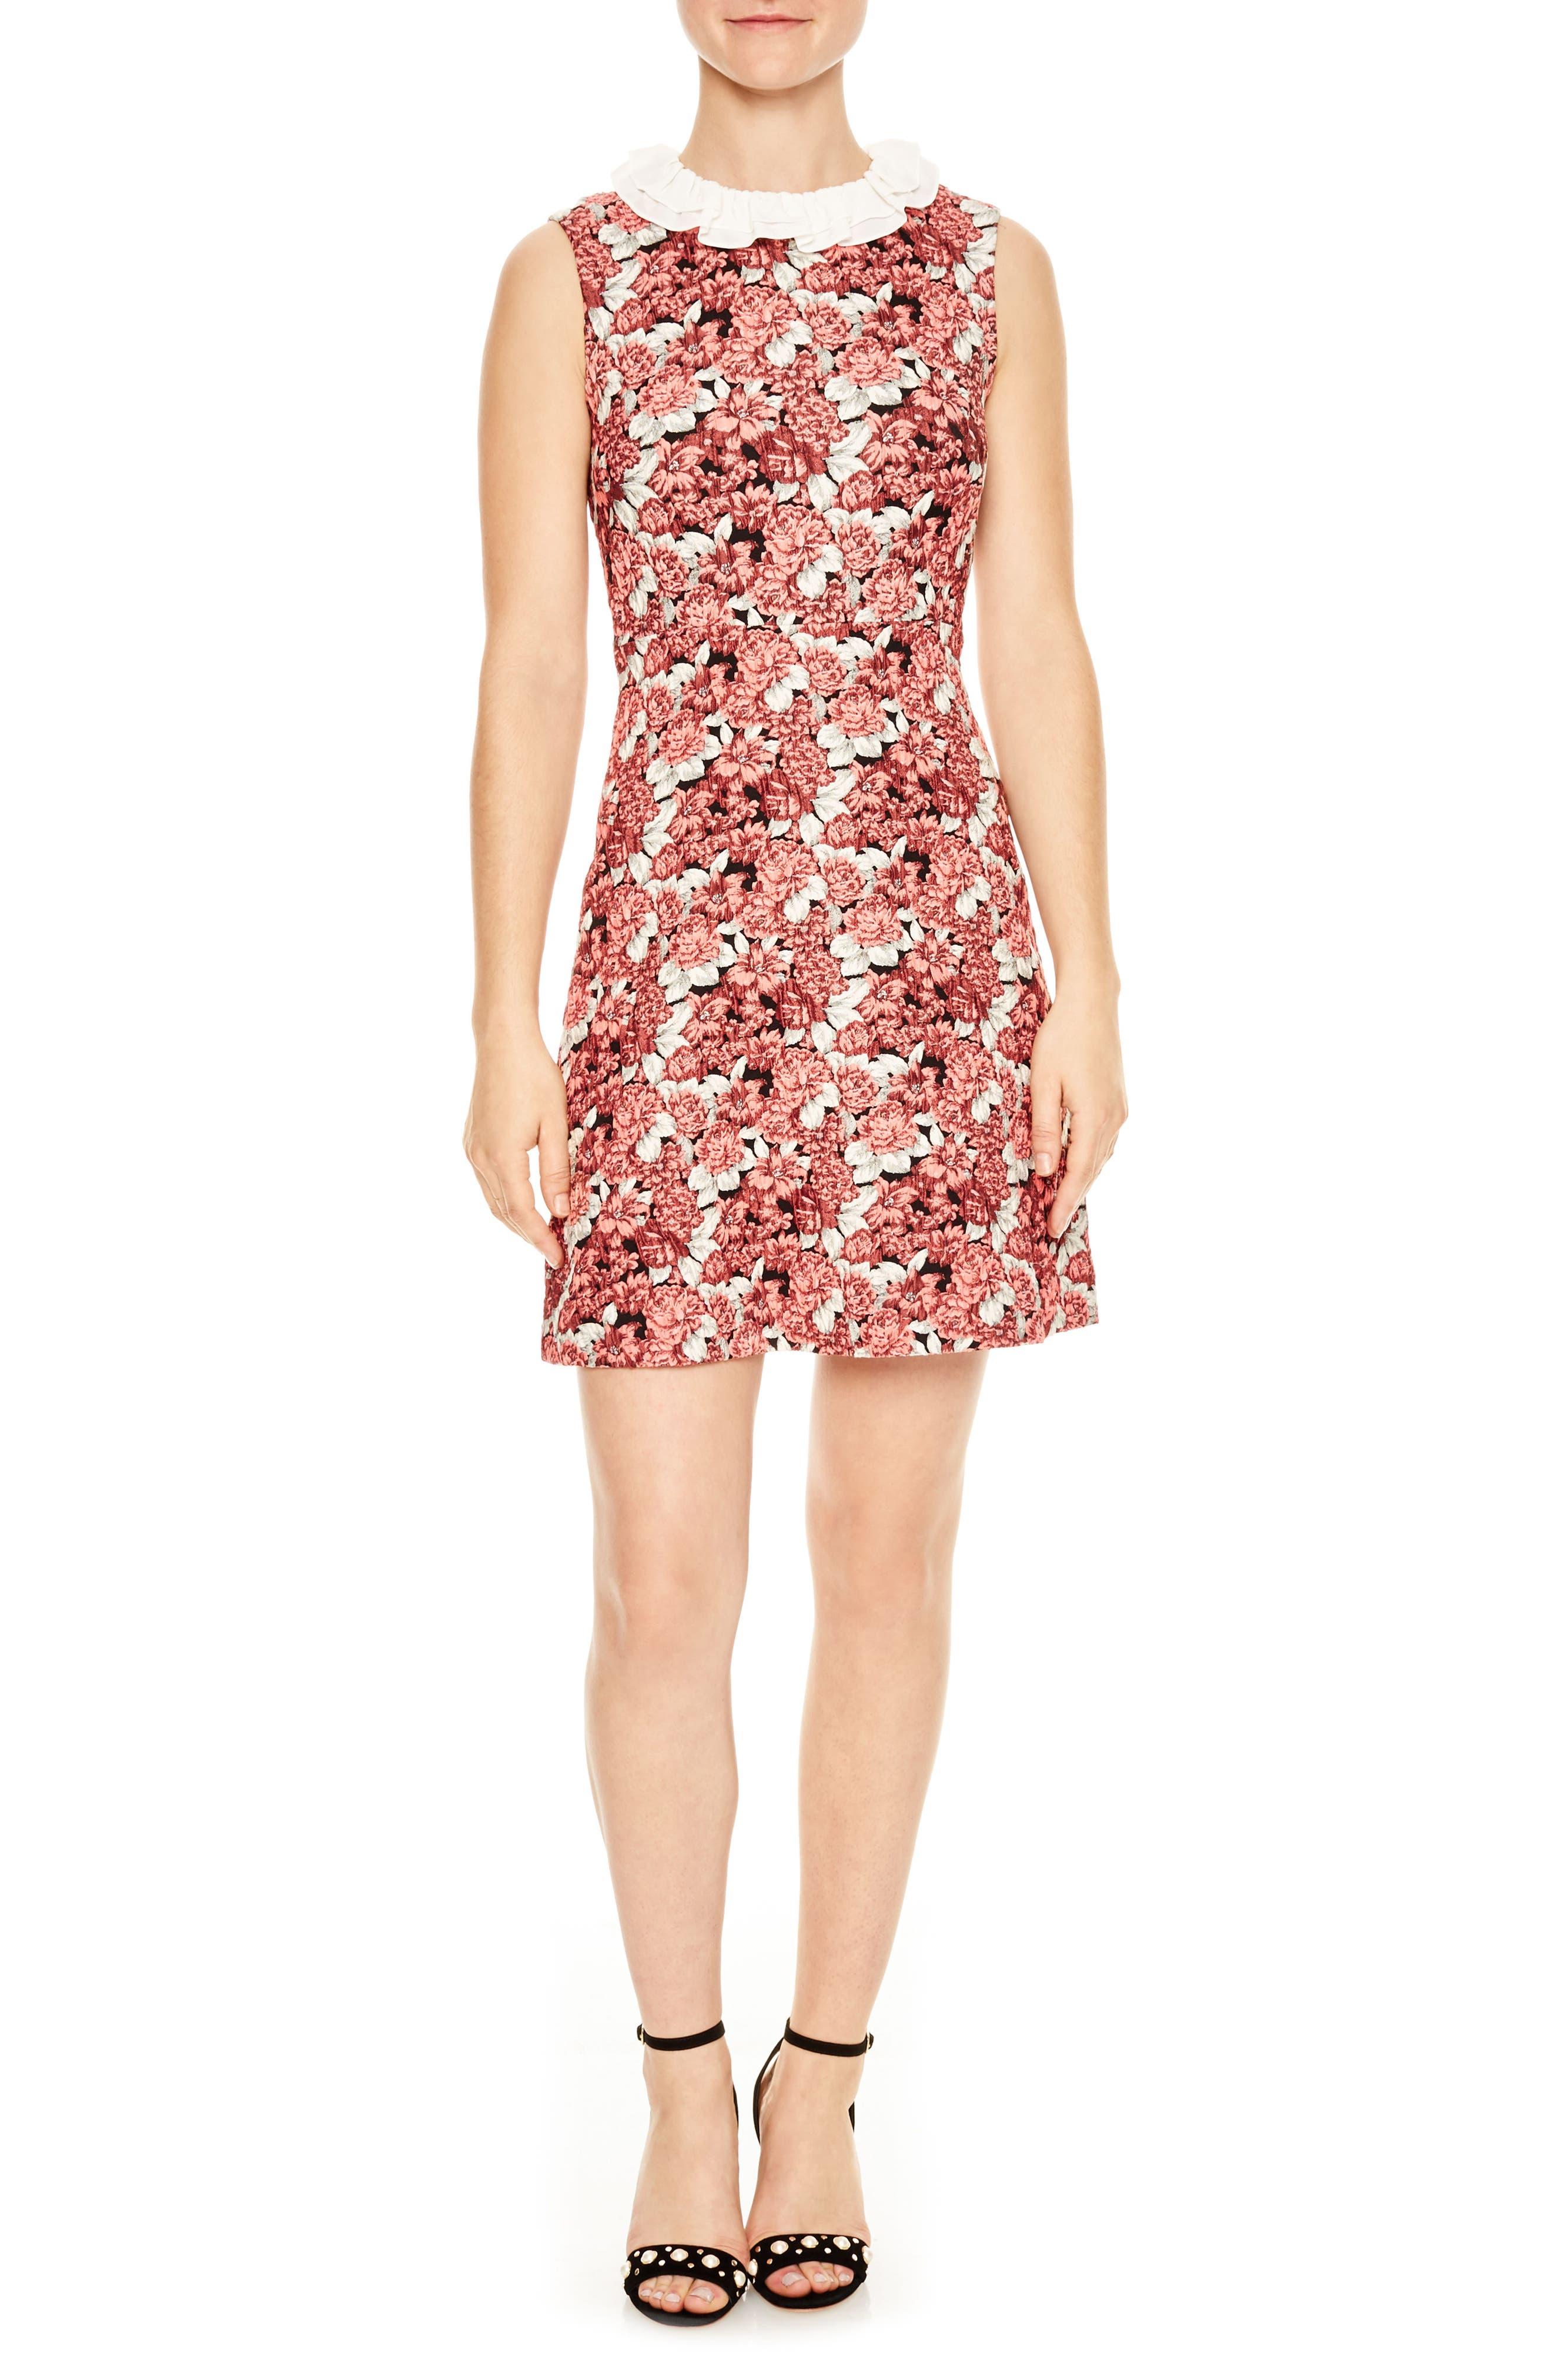 Edwige Floral Print Sheath Dress,                             Main thumbnail 1, color,